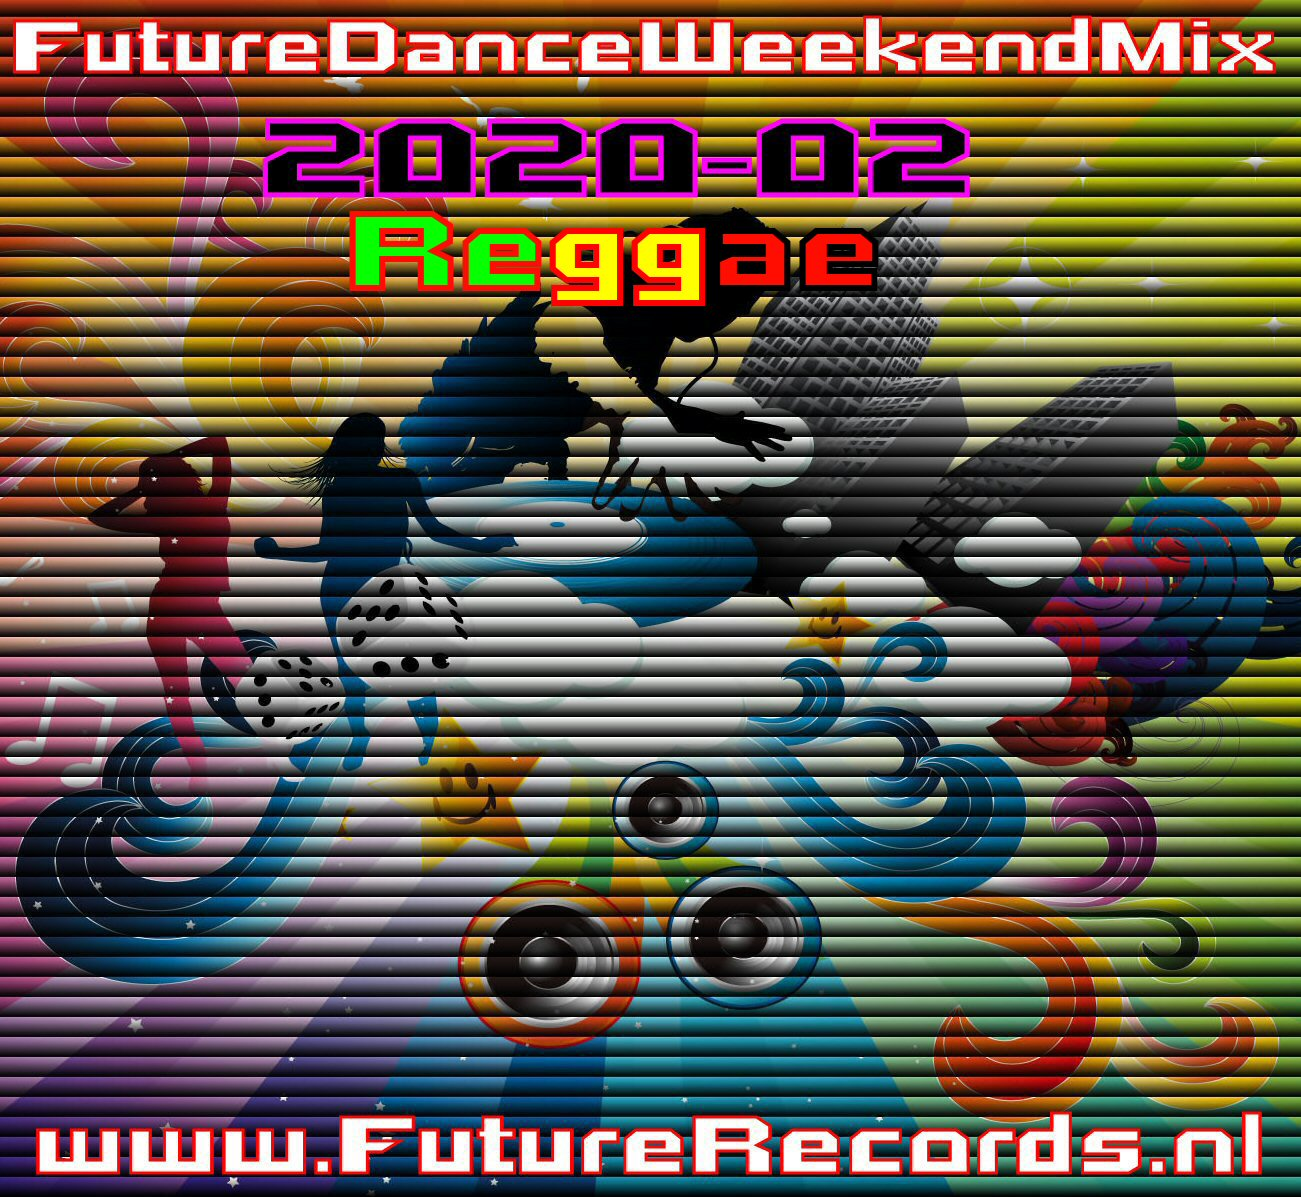 Future Dance Weekend Mix 2020-02